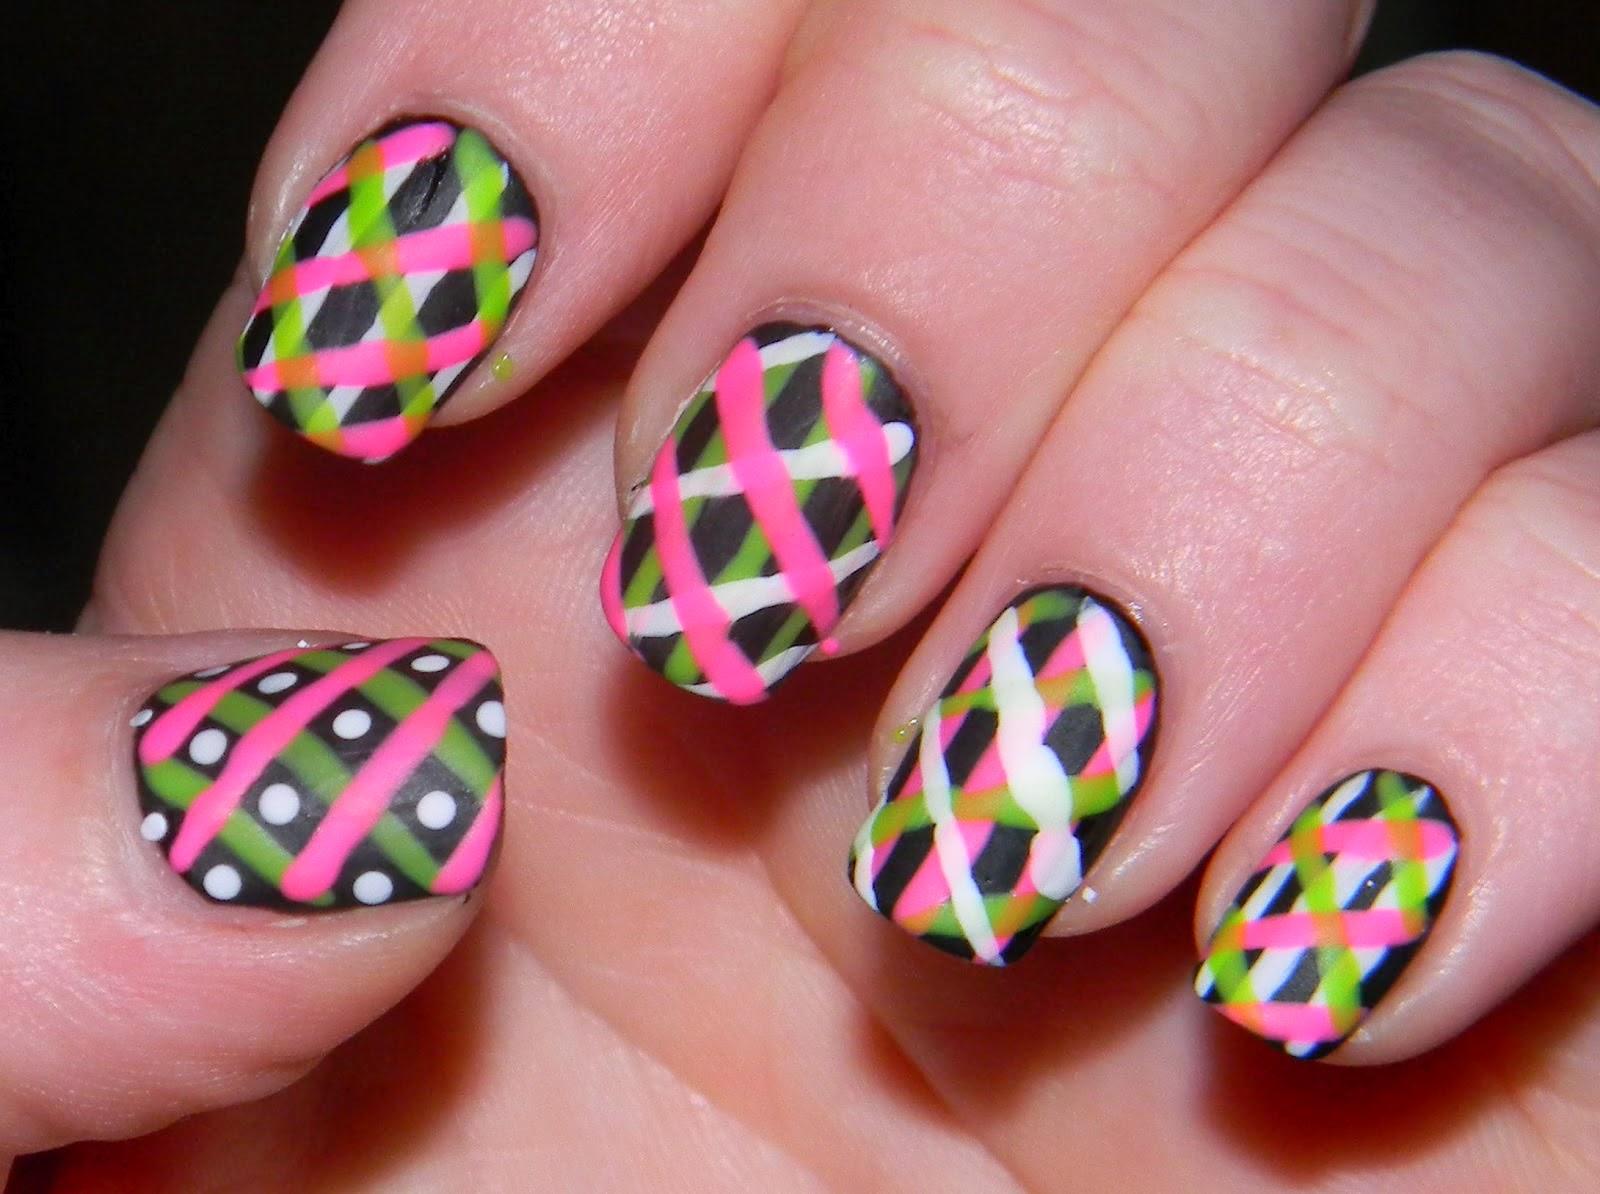 Nail Art Design Games Choice Image - nail art design simple step by step